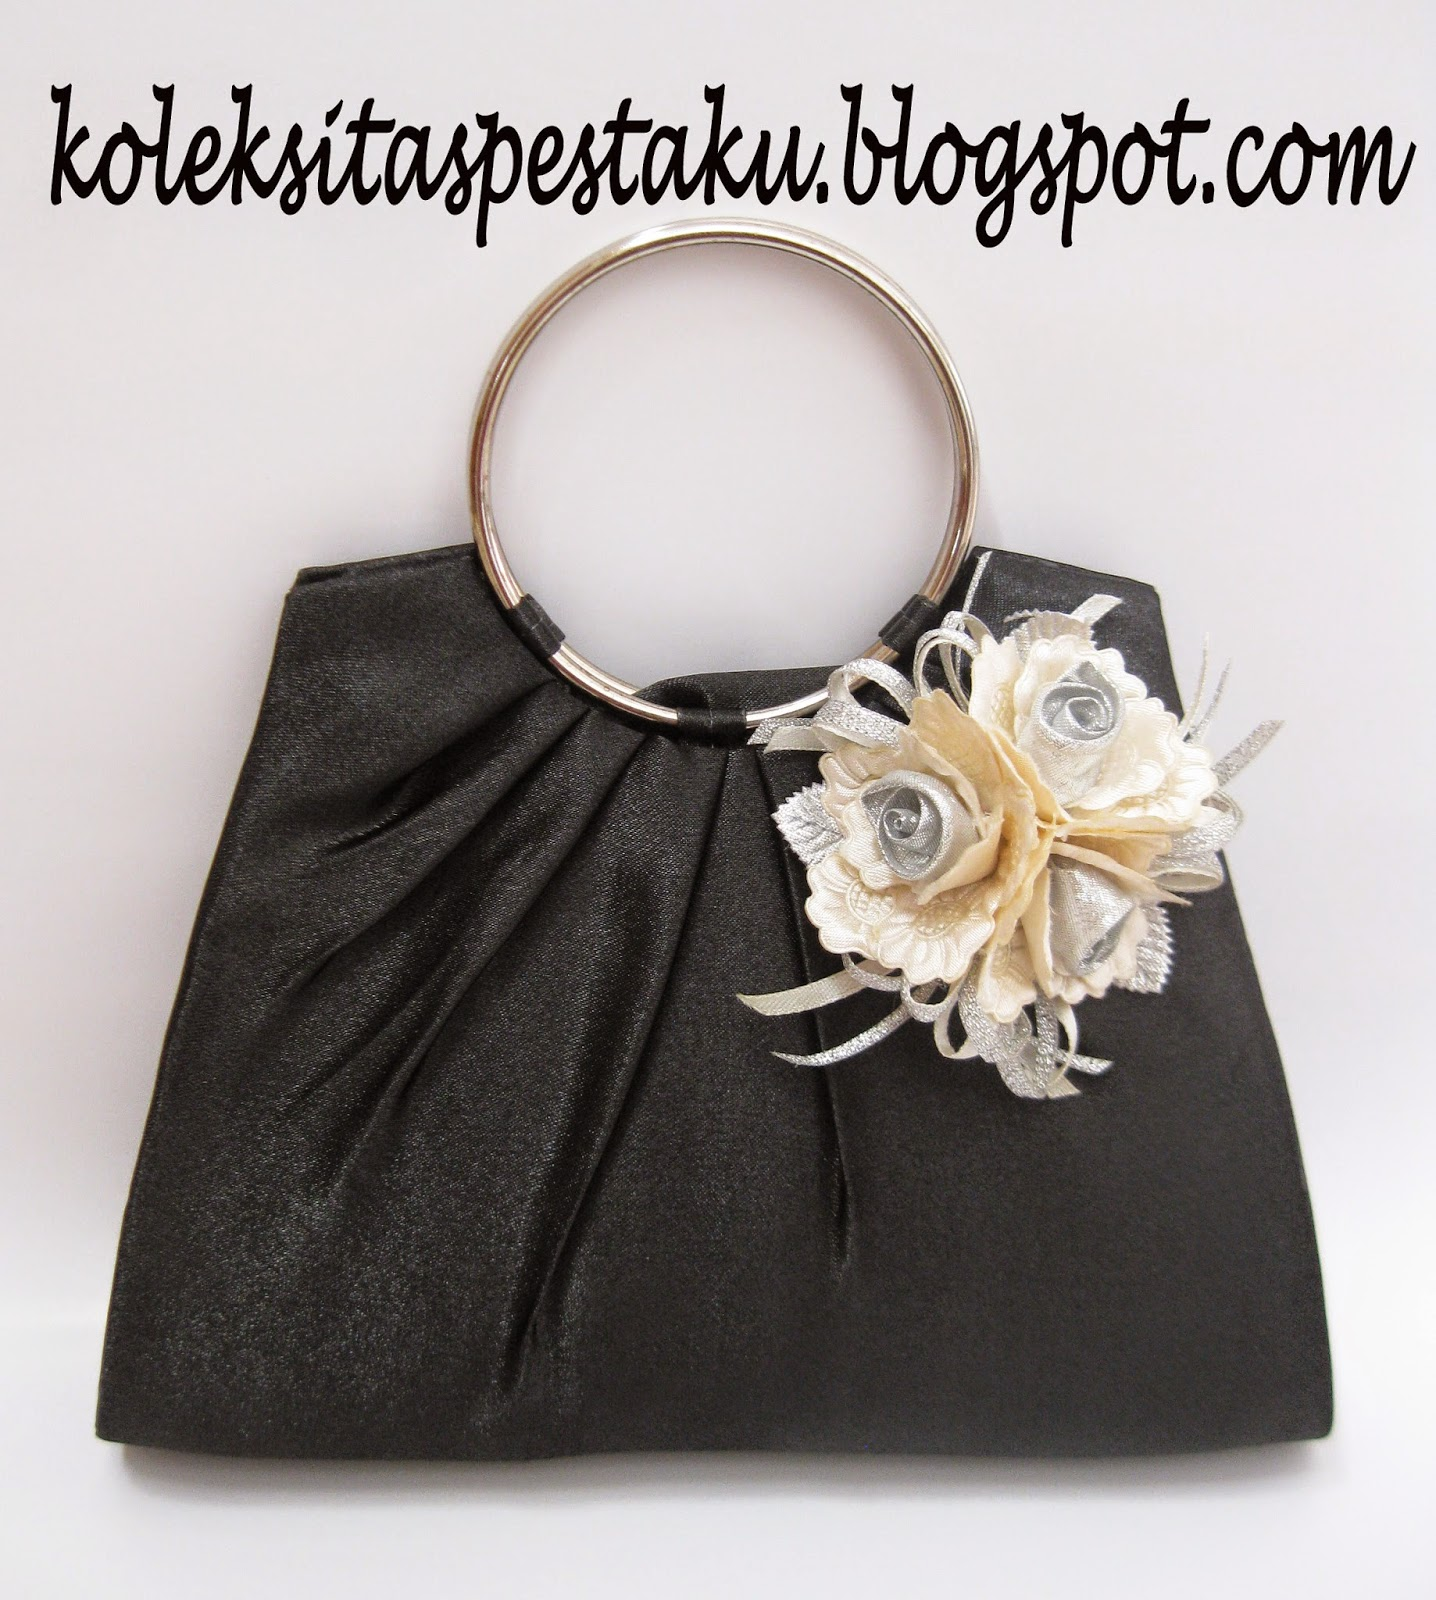 Tas Pesta - Clutch Bag  taspestaku  Online SHop Koleksi Tas Pesta Ku ... 8de9bb0341